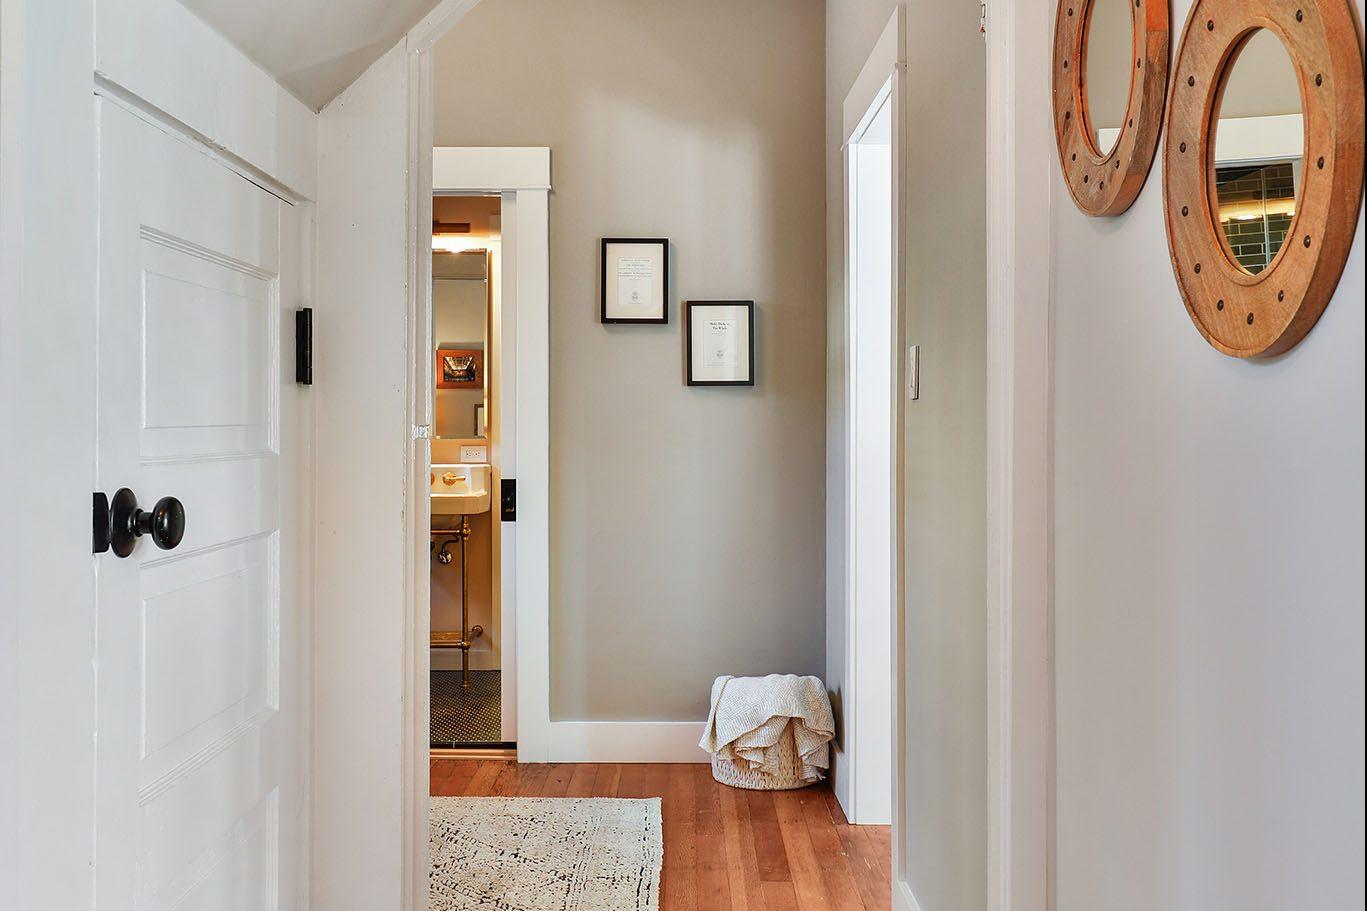 SF Real Estate - Hallway